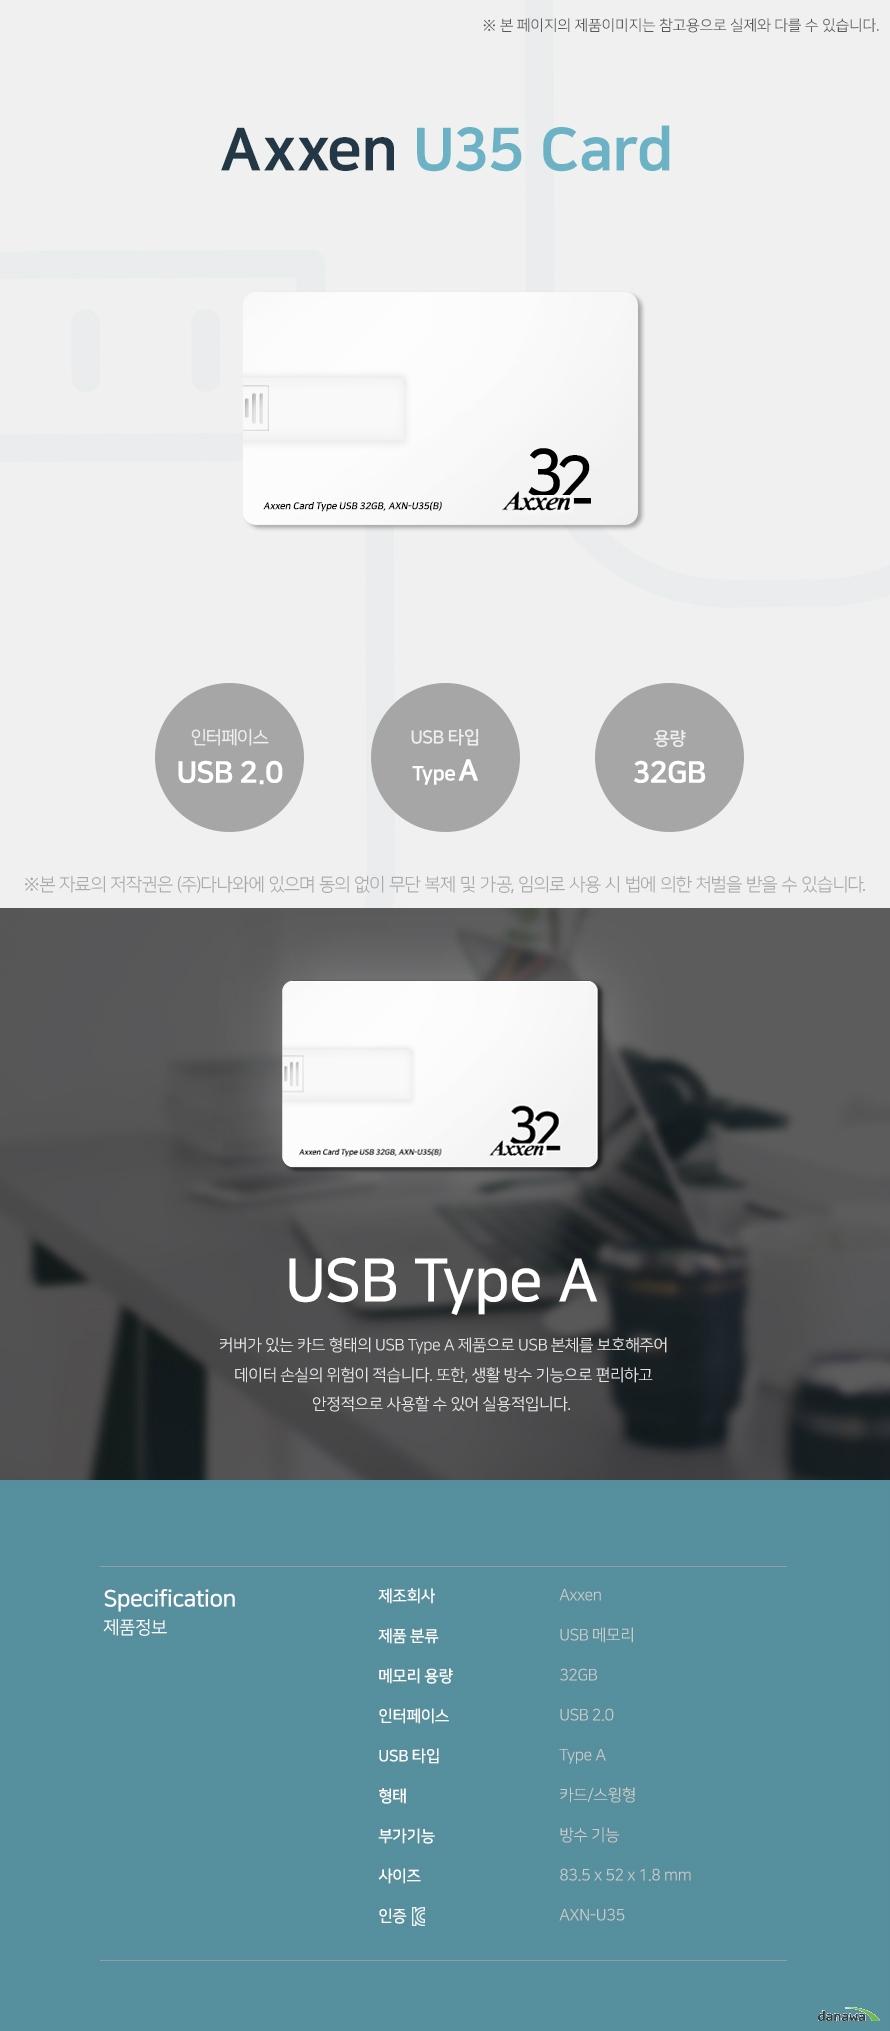 Axxen U35 Card 32GB USB Type A 커버가 있는 카드 형태의 USB Type A 제품으로 USB 본체를 보호해주어 데이터 손실의   의험이 적습니다. 또한, 생활 방수 기능으로 편리하고 안정적으로 사용할 수 있어 실용적입니다. 스펙 제조회사 AXXEN 제품 분류 USB 메모리 메모리 용량 32GB 인터페이스 USB 2.0 USB 타입 Type A 형태 카드/스윙형 부가기능 방수 기능 사이즈 83.5x52x1.8mm KC인증 AXN-U35